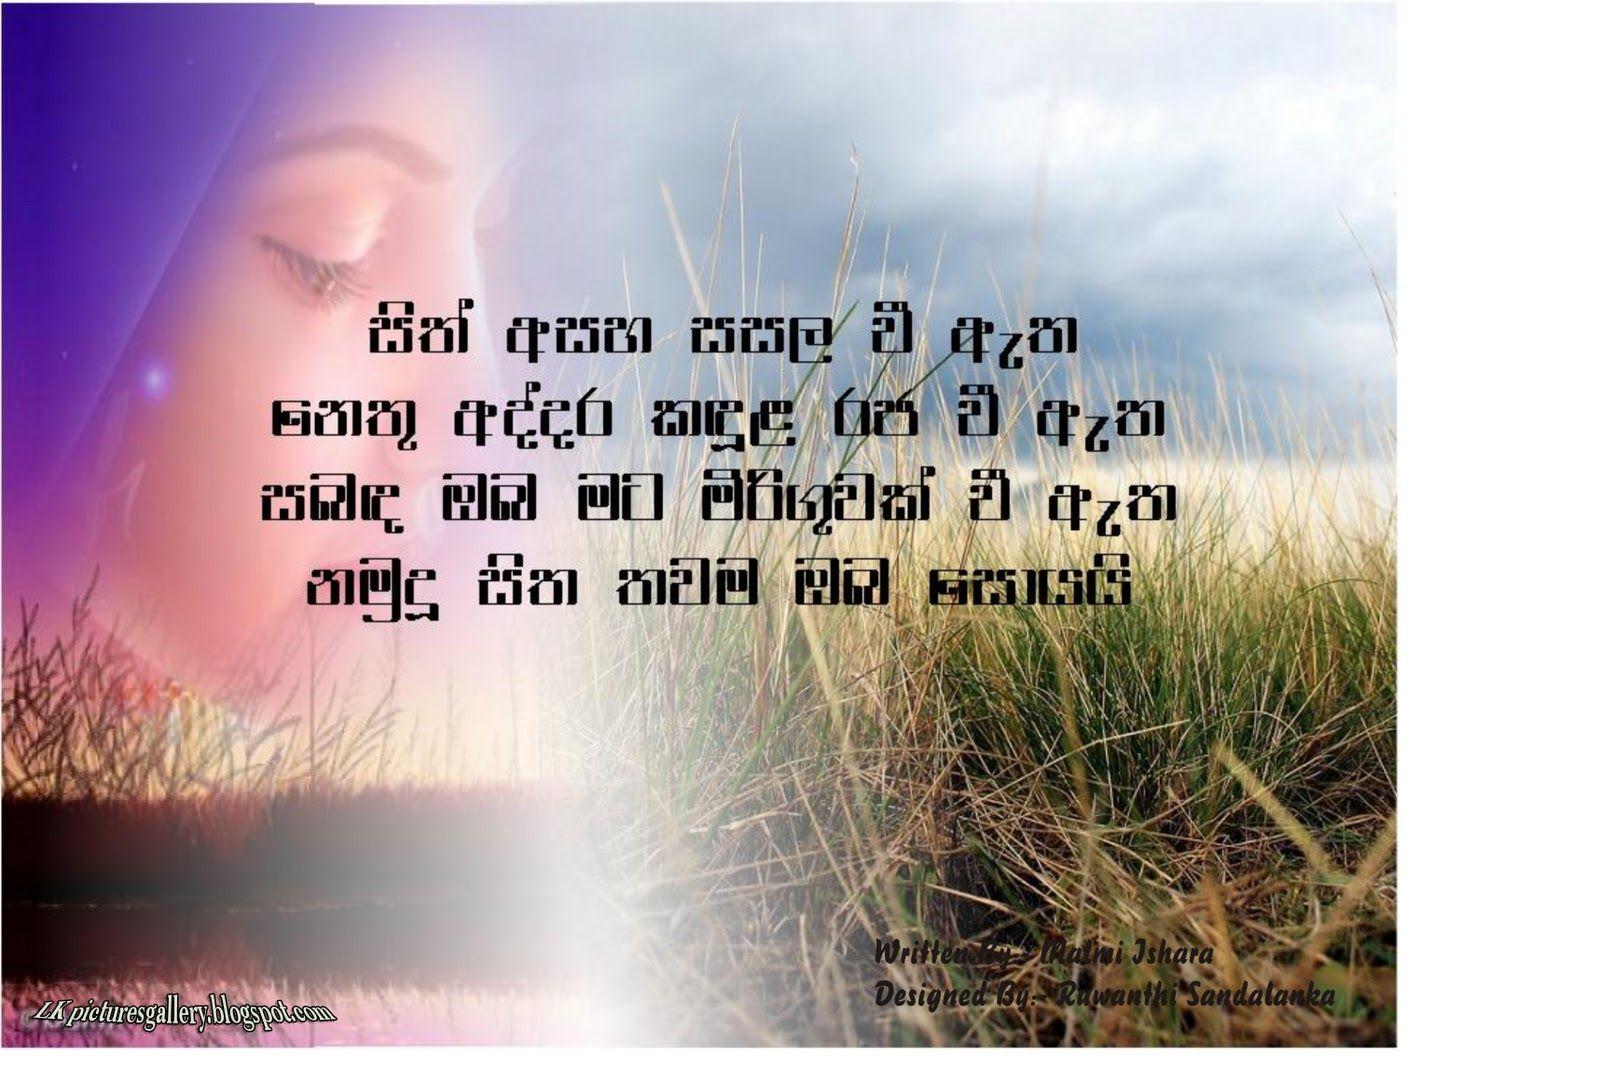 beautiful love quotes in sinhala yckppaoh sinhala nisadas